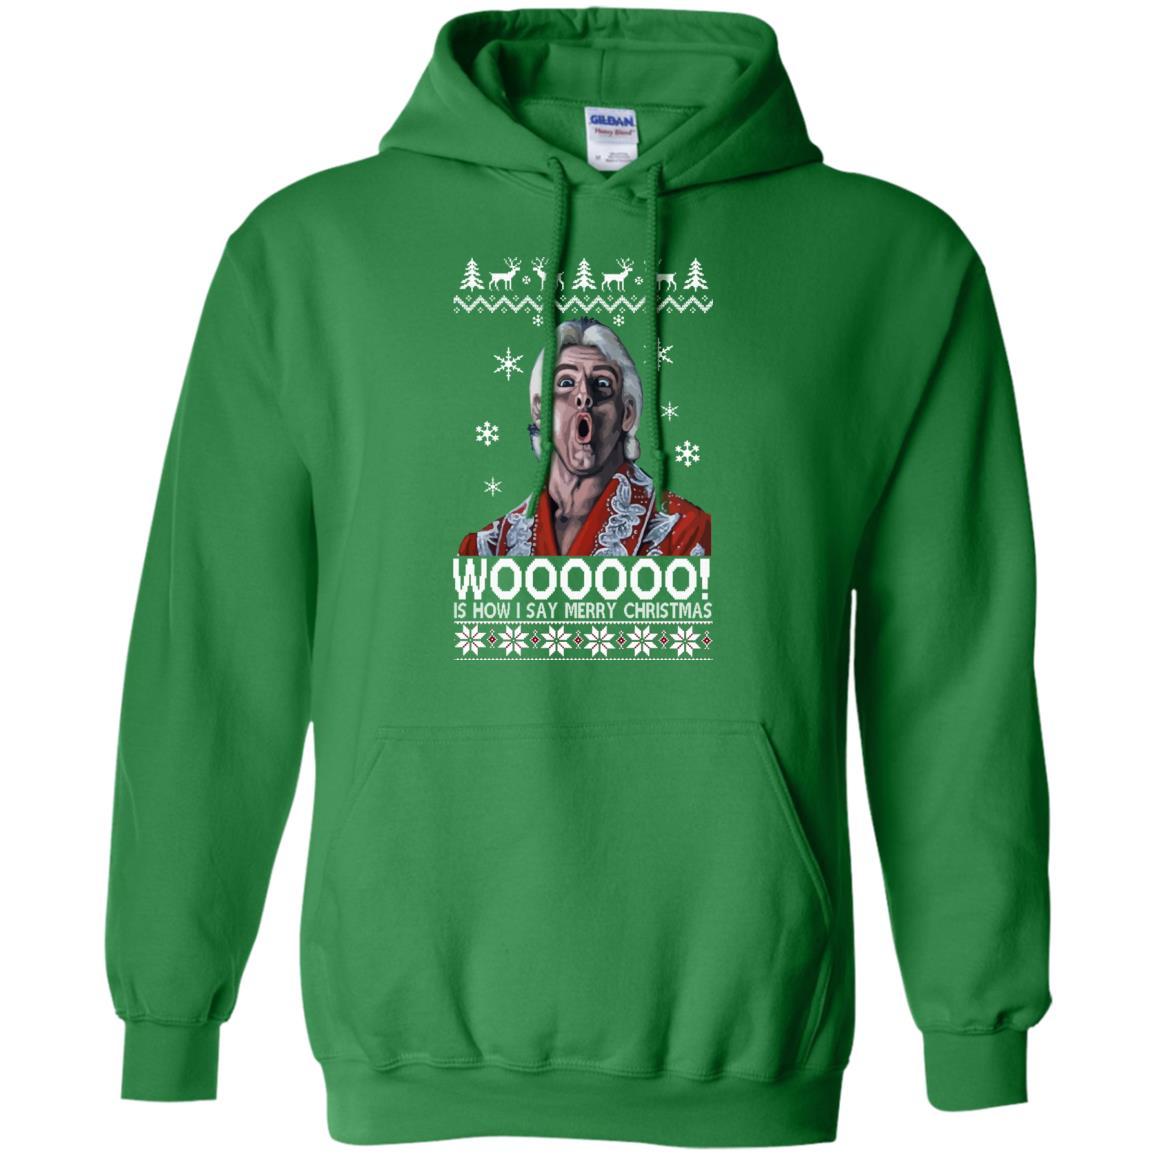 image 1640 - Green Ric Flair WOO Christmas Sweater, Ugly Sweatshirt